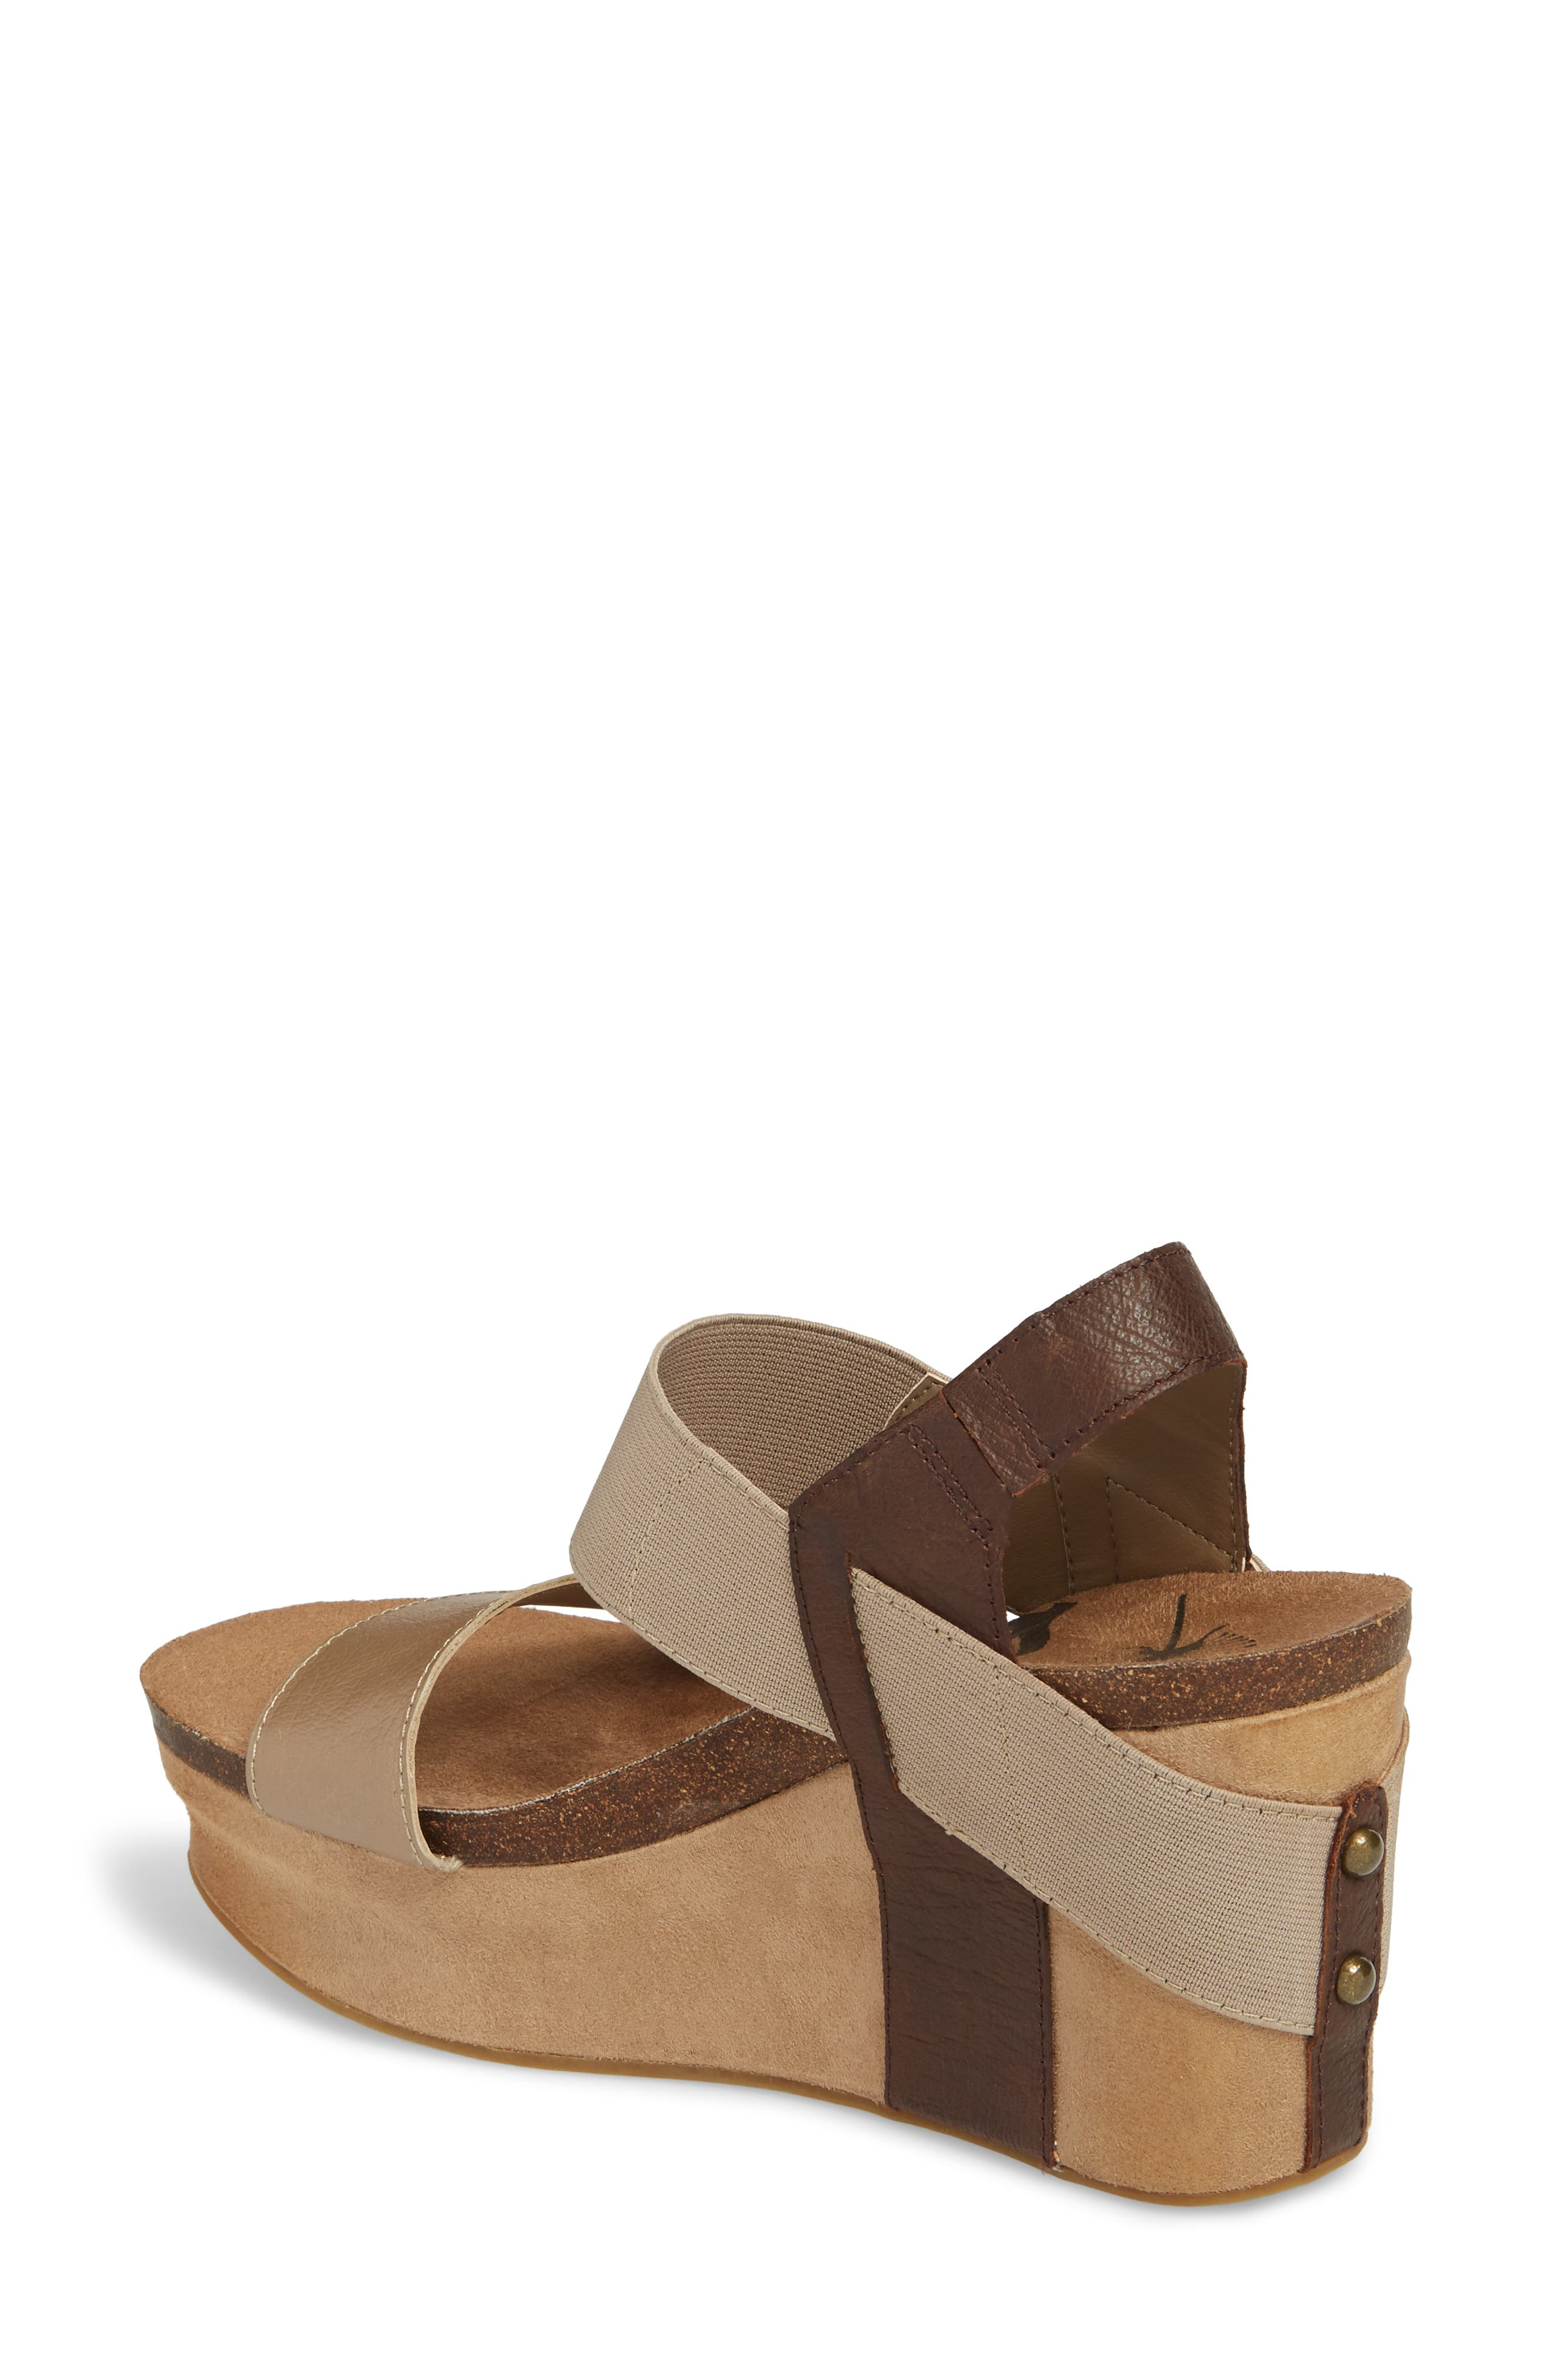 Alternate Image 2  - OTBT 'Bushnell' Wedge Sandal